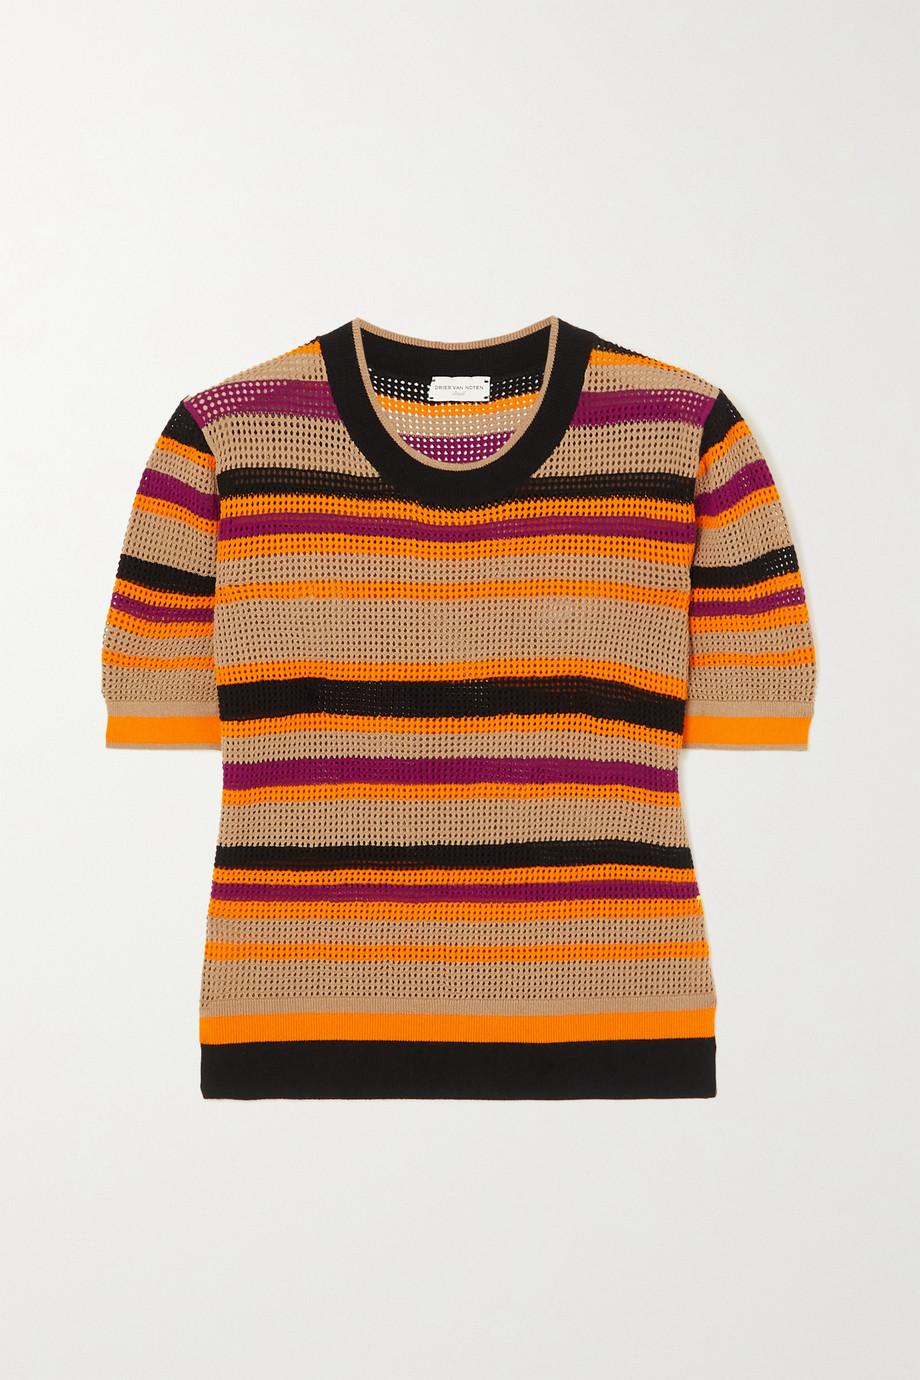 Dries Van Noten Striped mesh T-shirt